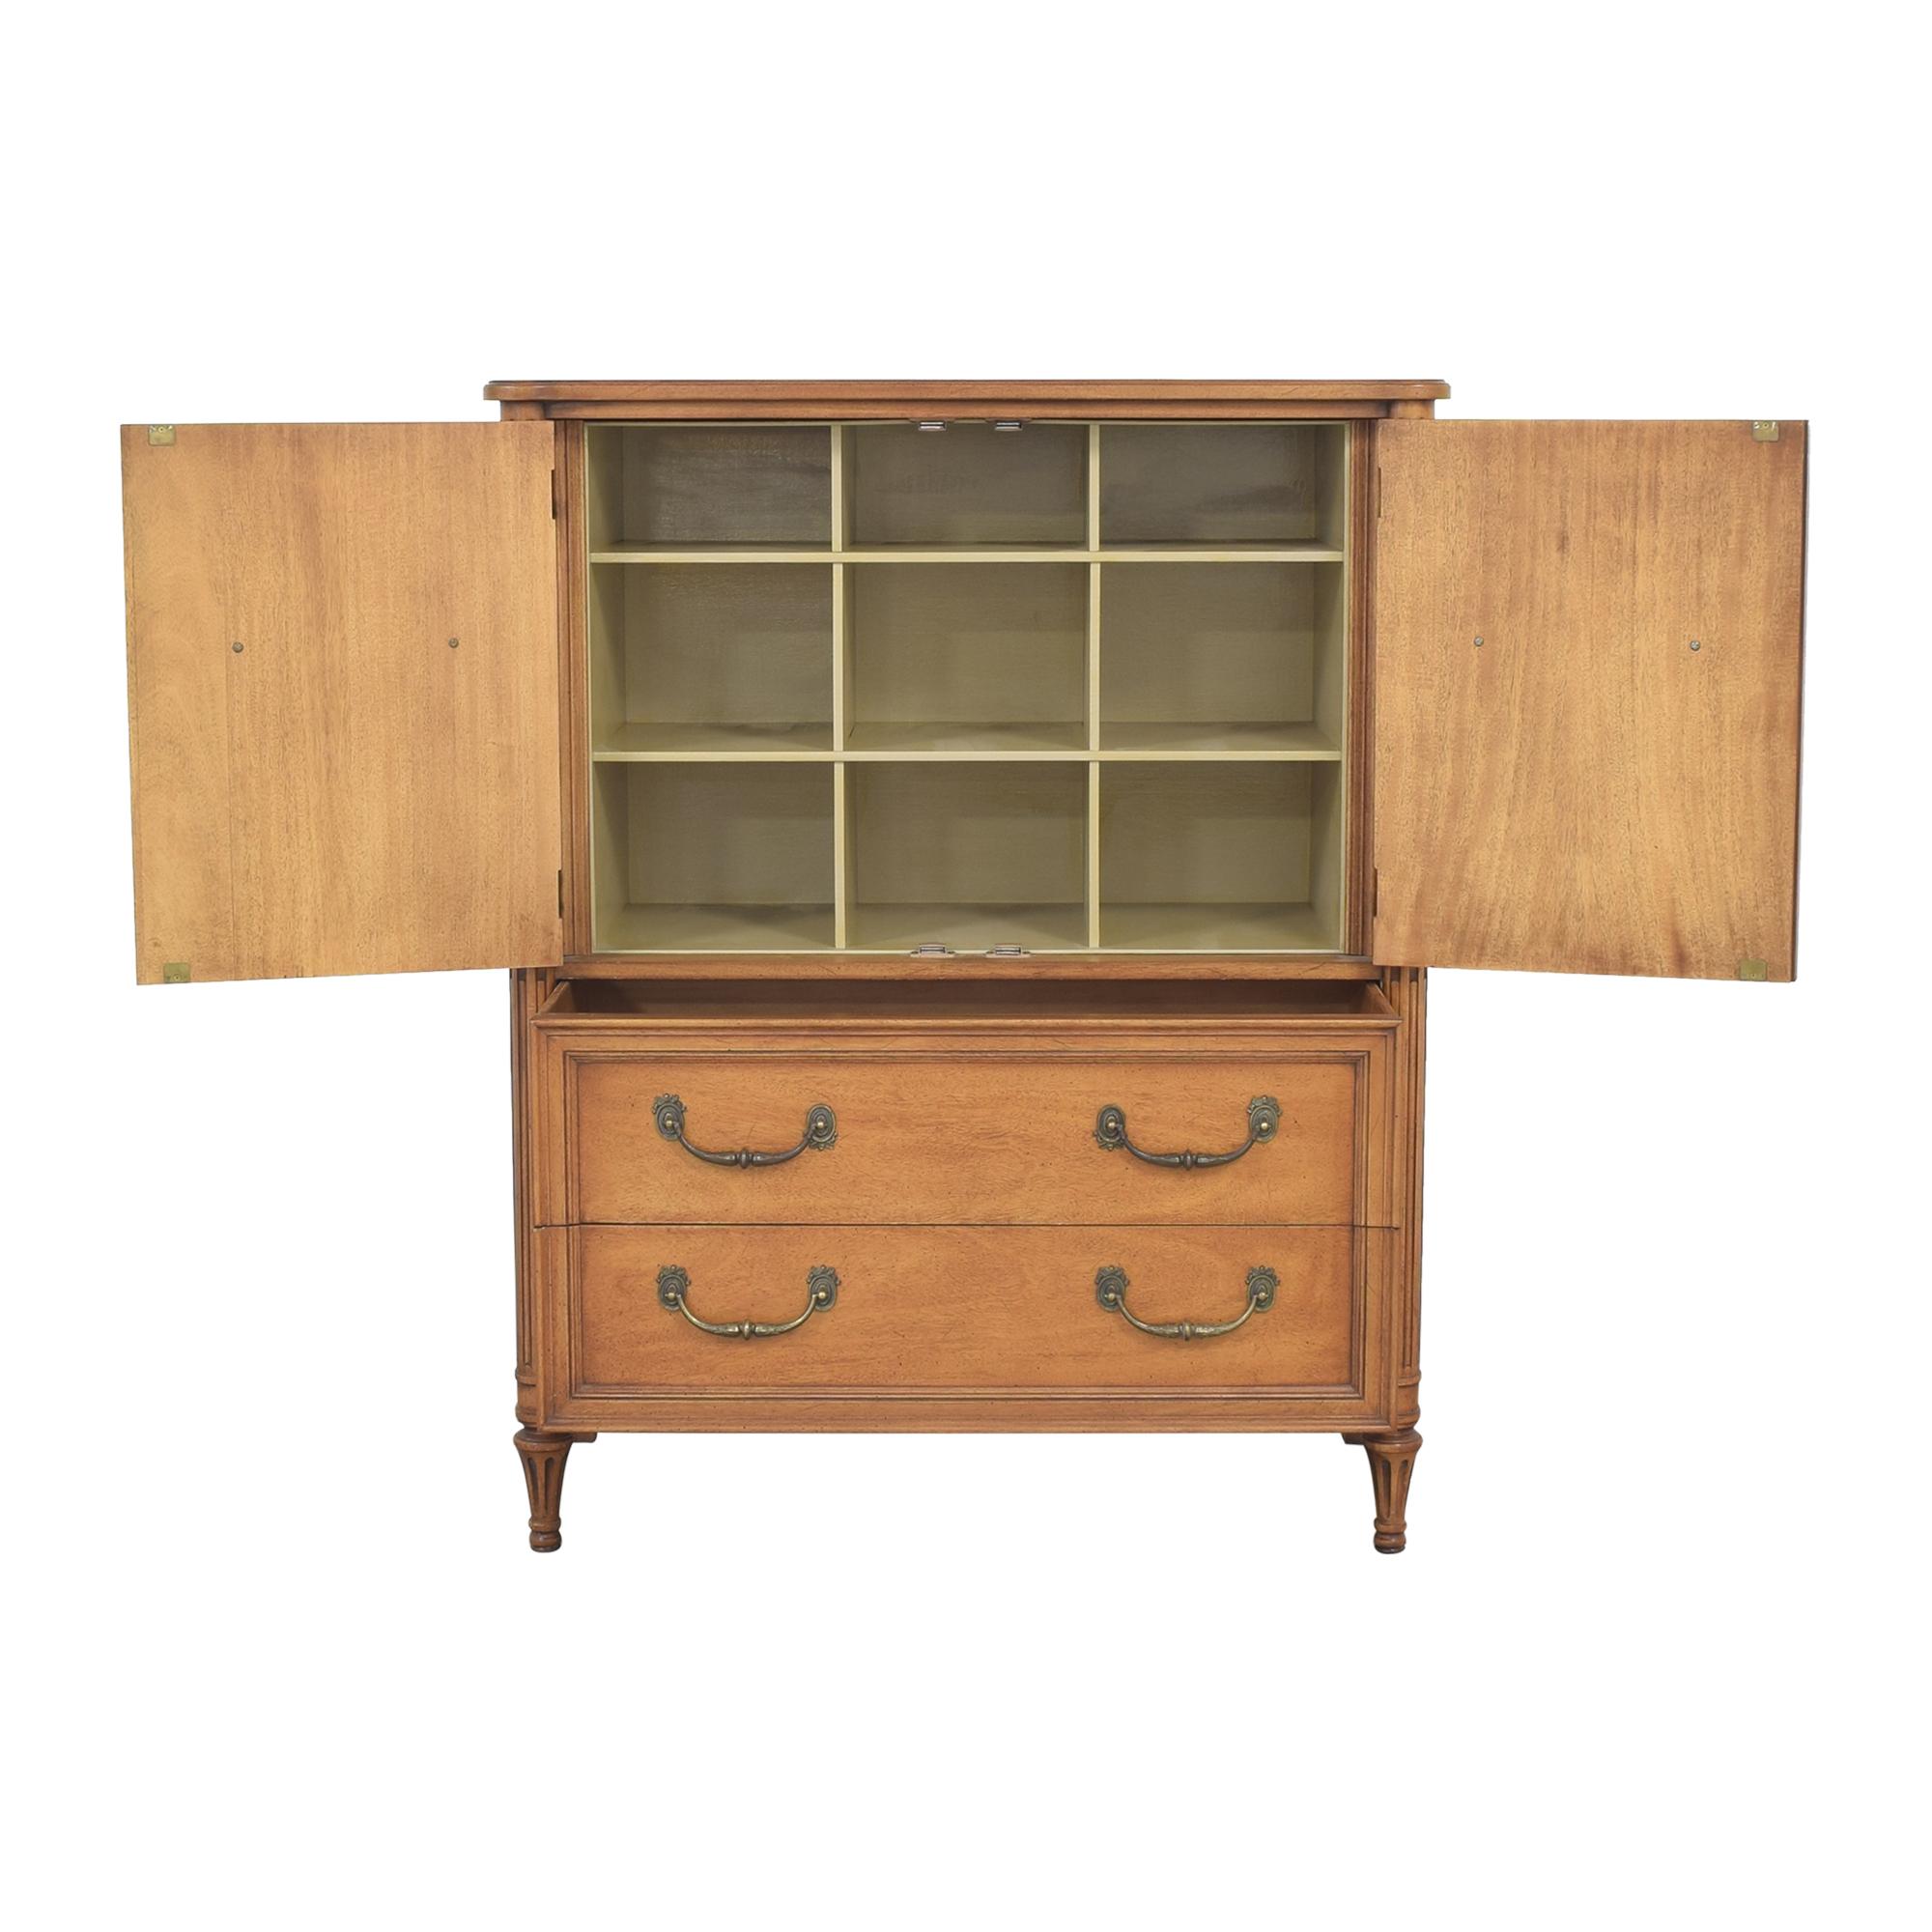 Henredon Furniture Henredon Furniture Two Door Armoire ct